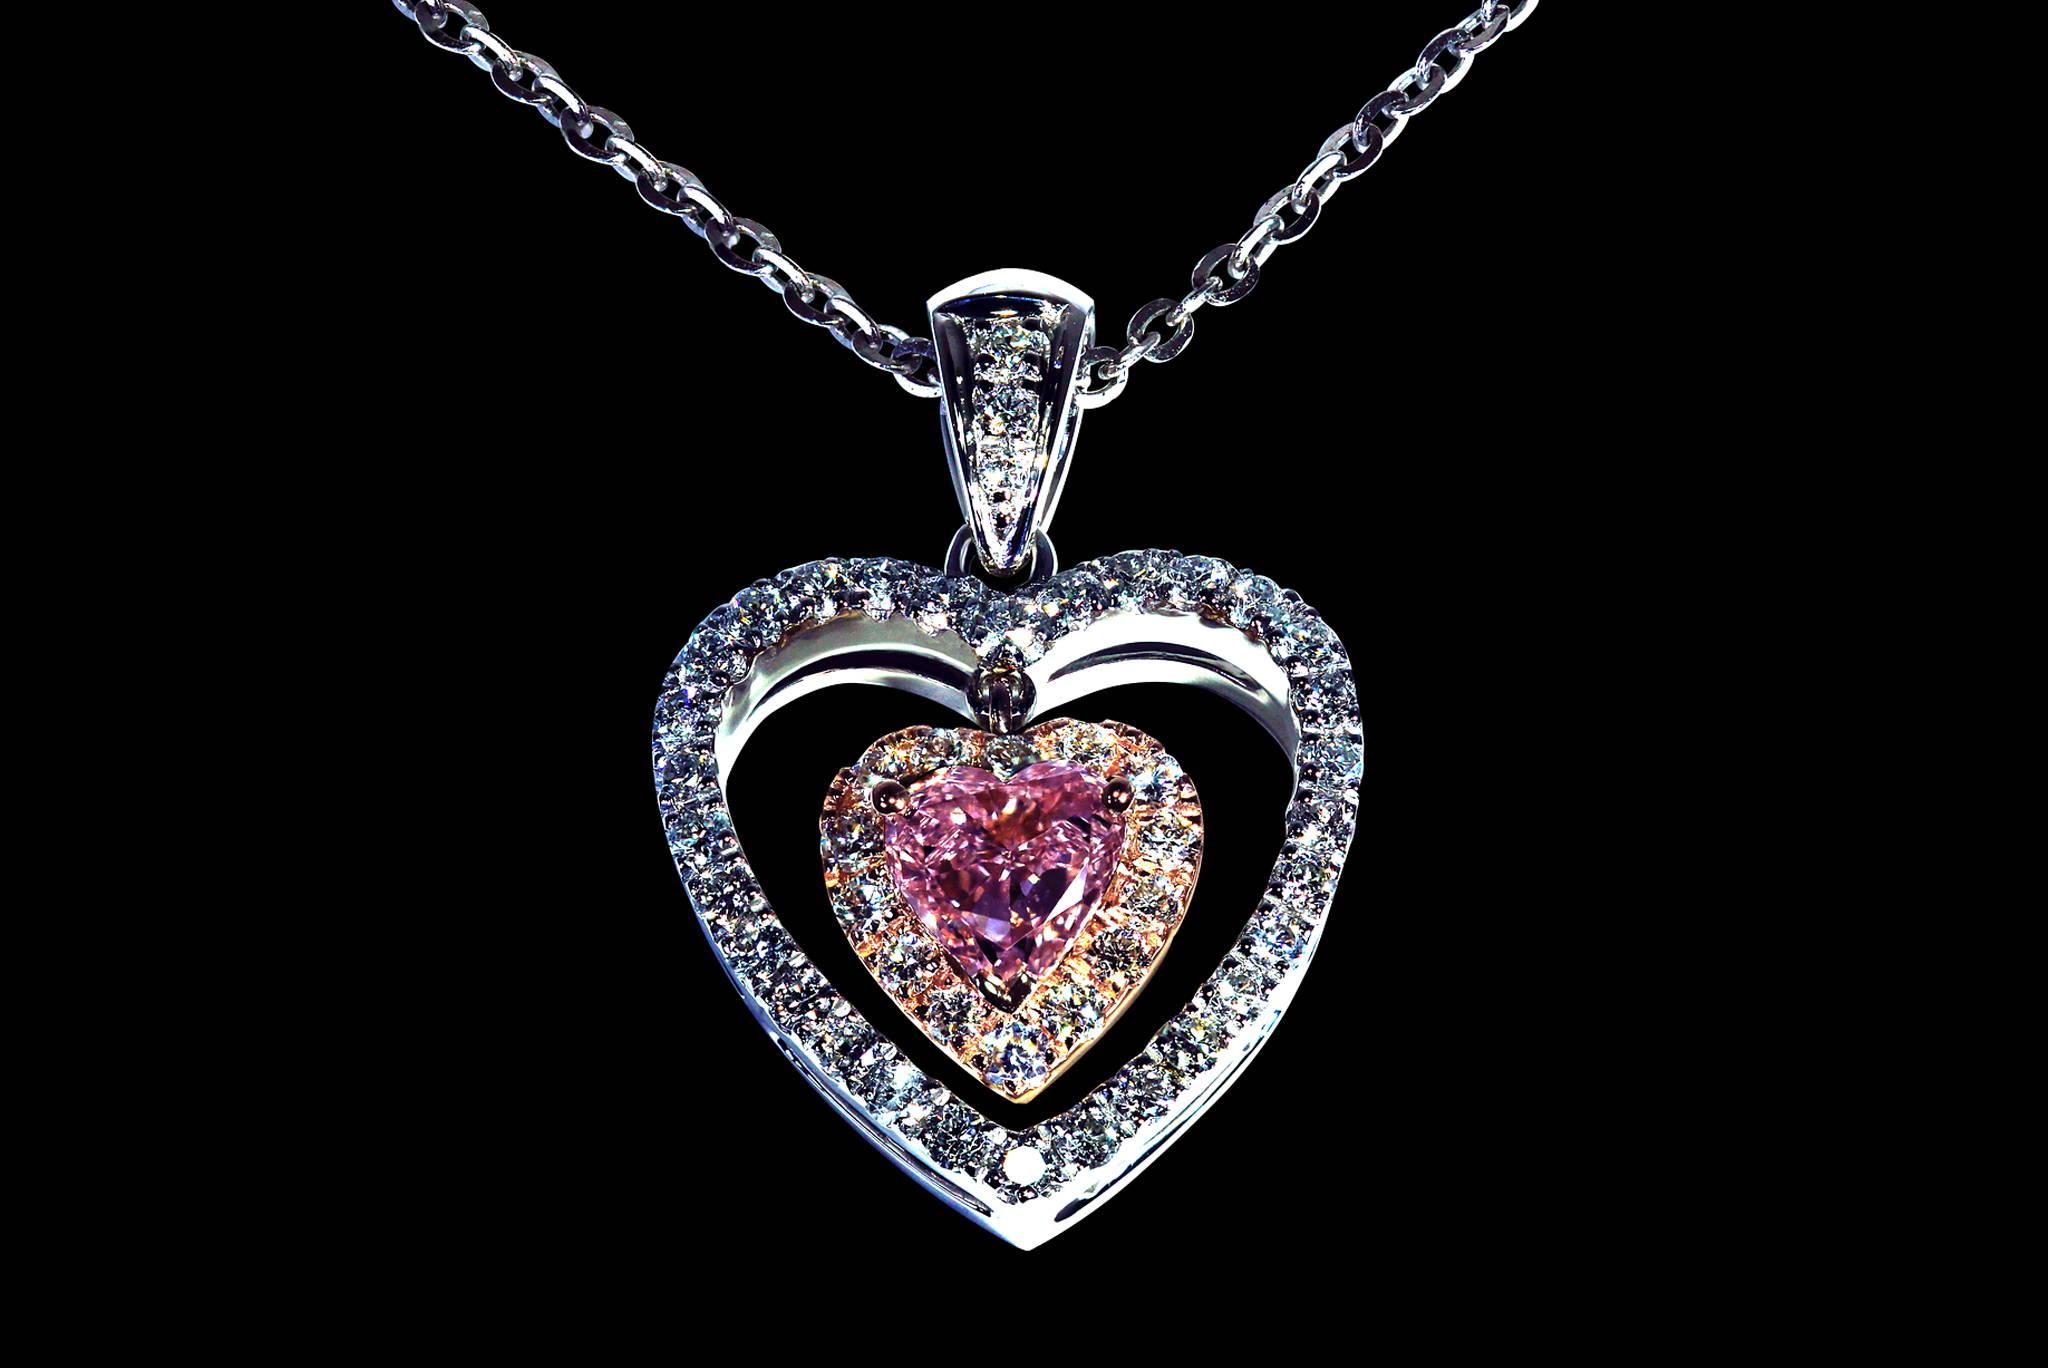 Fancy Vivid Purplish Pink Dangling Heart Pendant front view